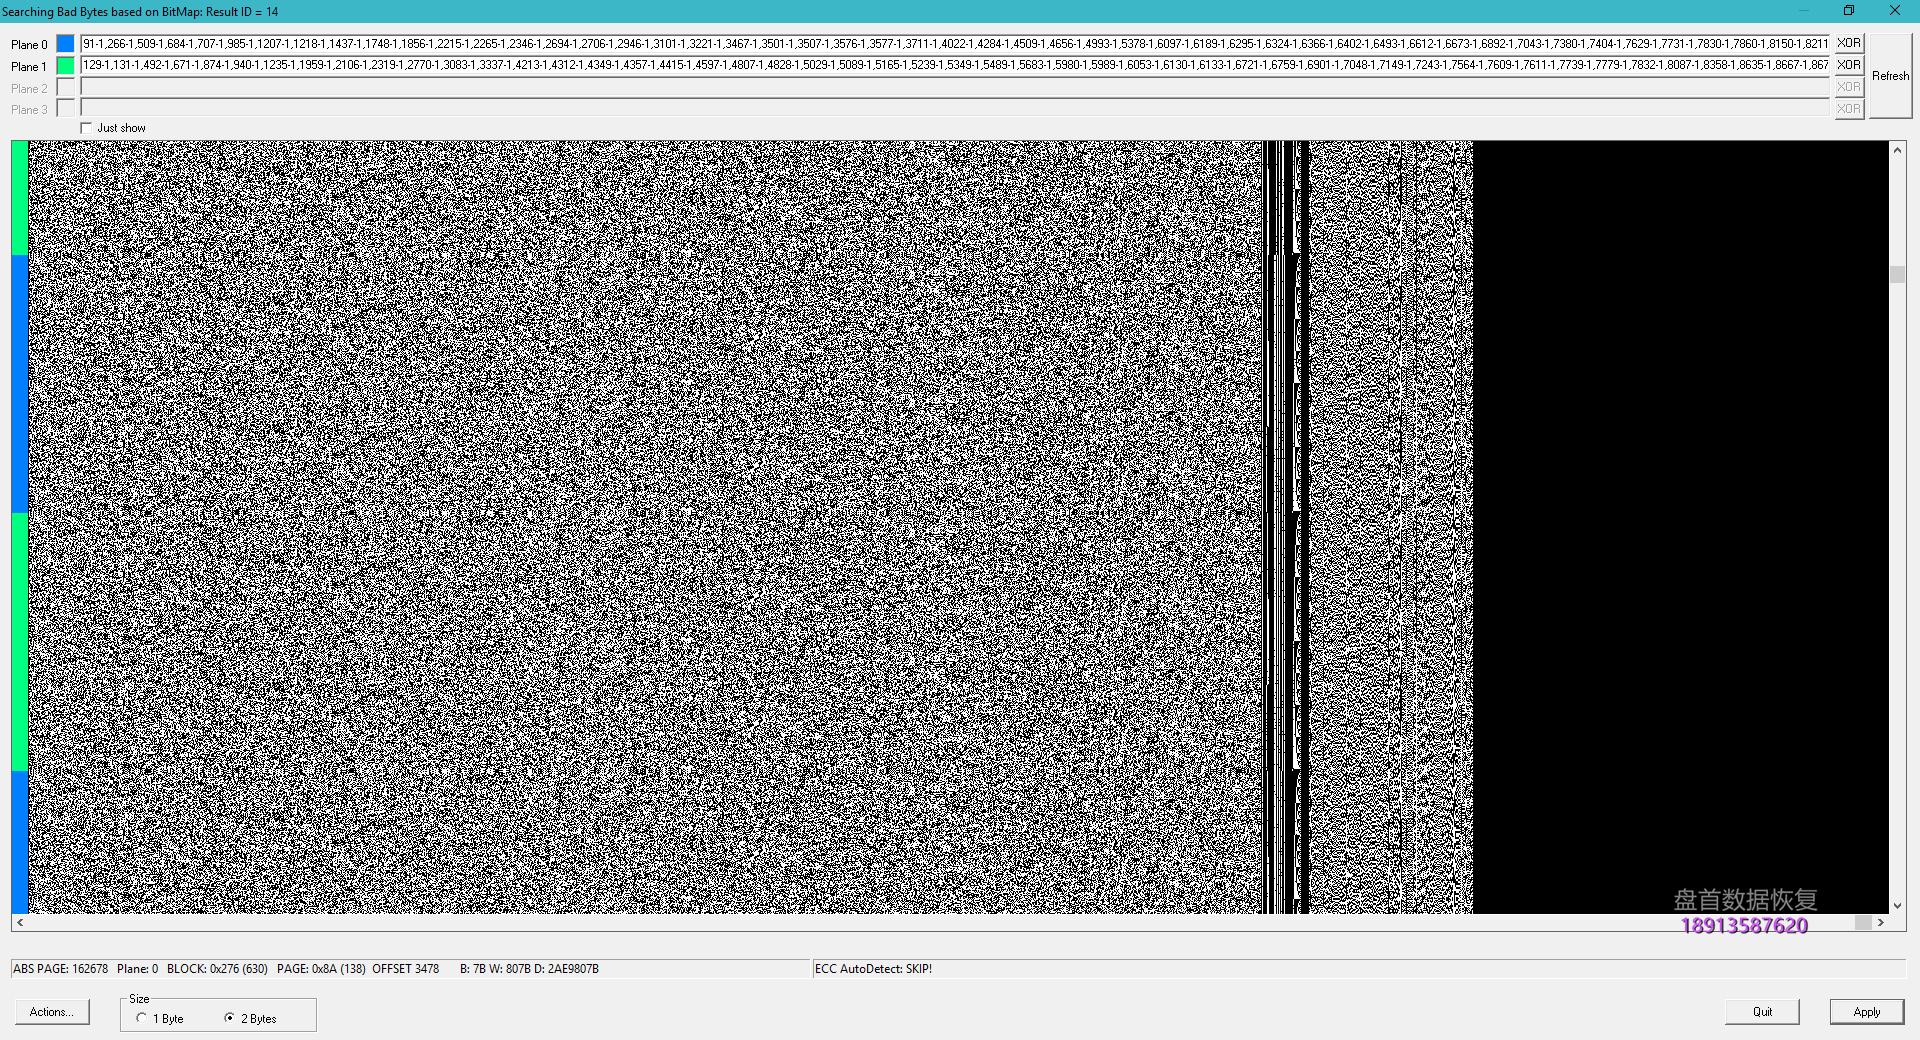 0 PC-3000 Flash 7.2.9.4131 自动Bad Bytes(坏字节)切割功能